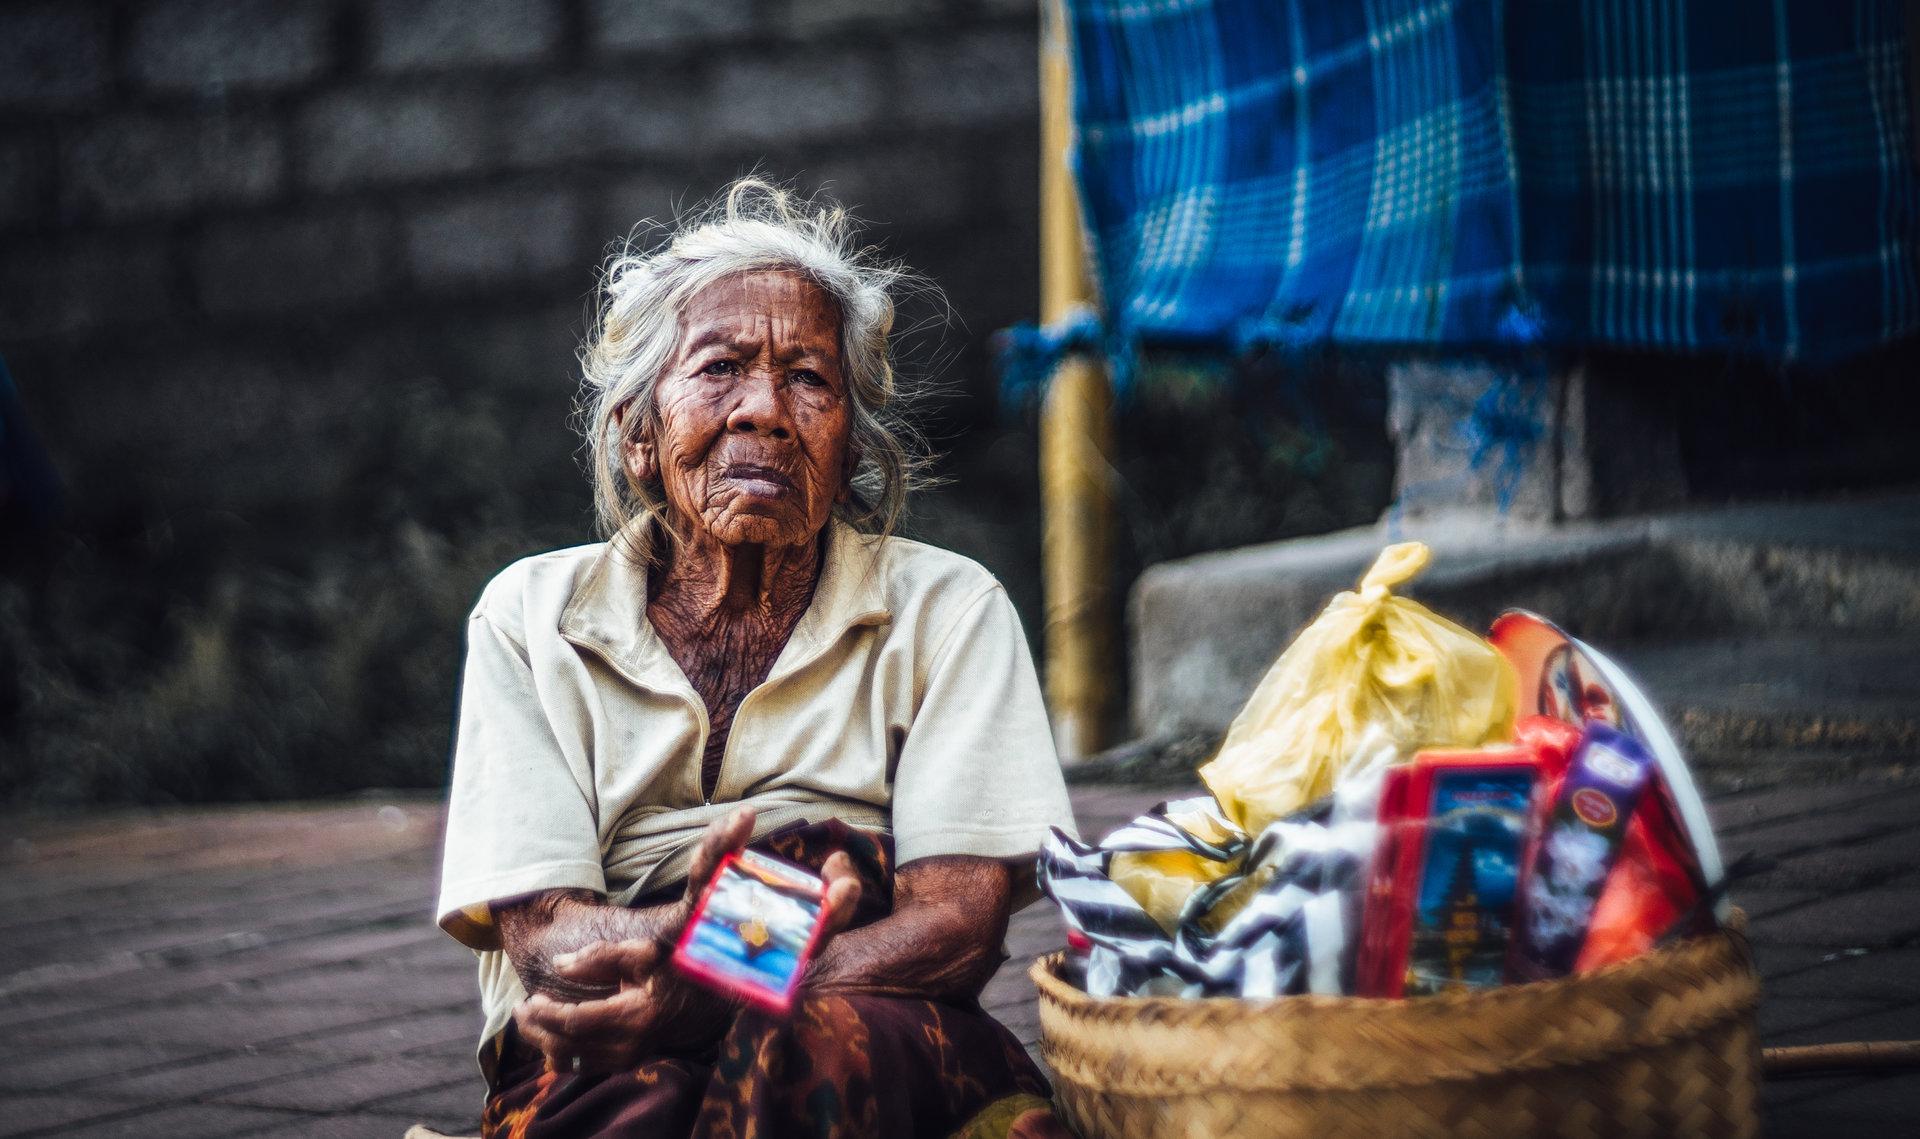 old woman | Author Stanislav Kehayov - tachi_blg | PHOTO FORUM